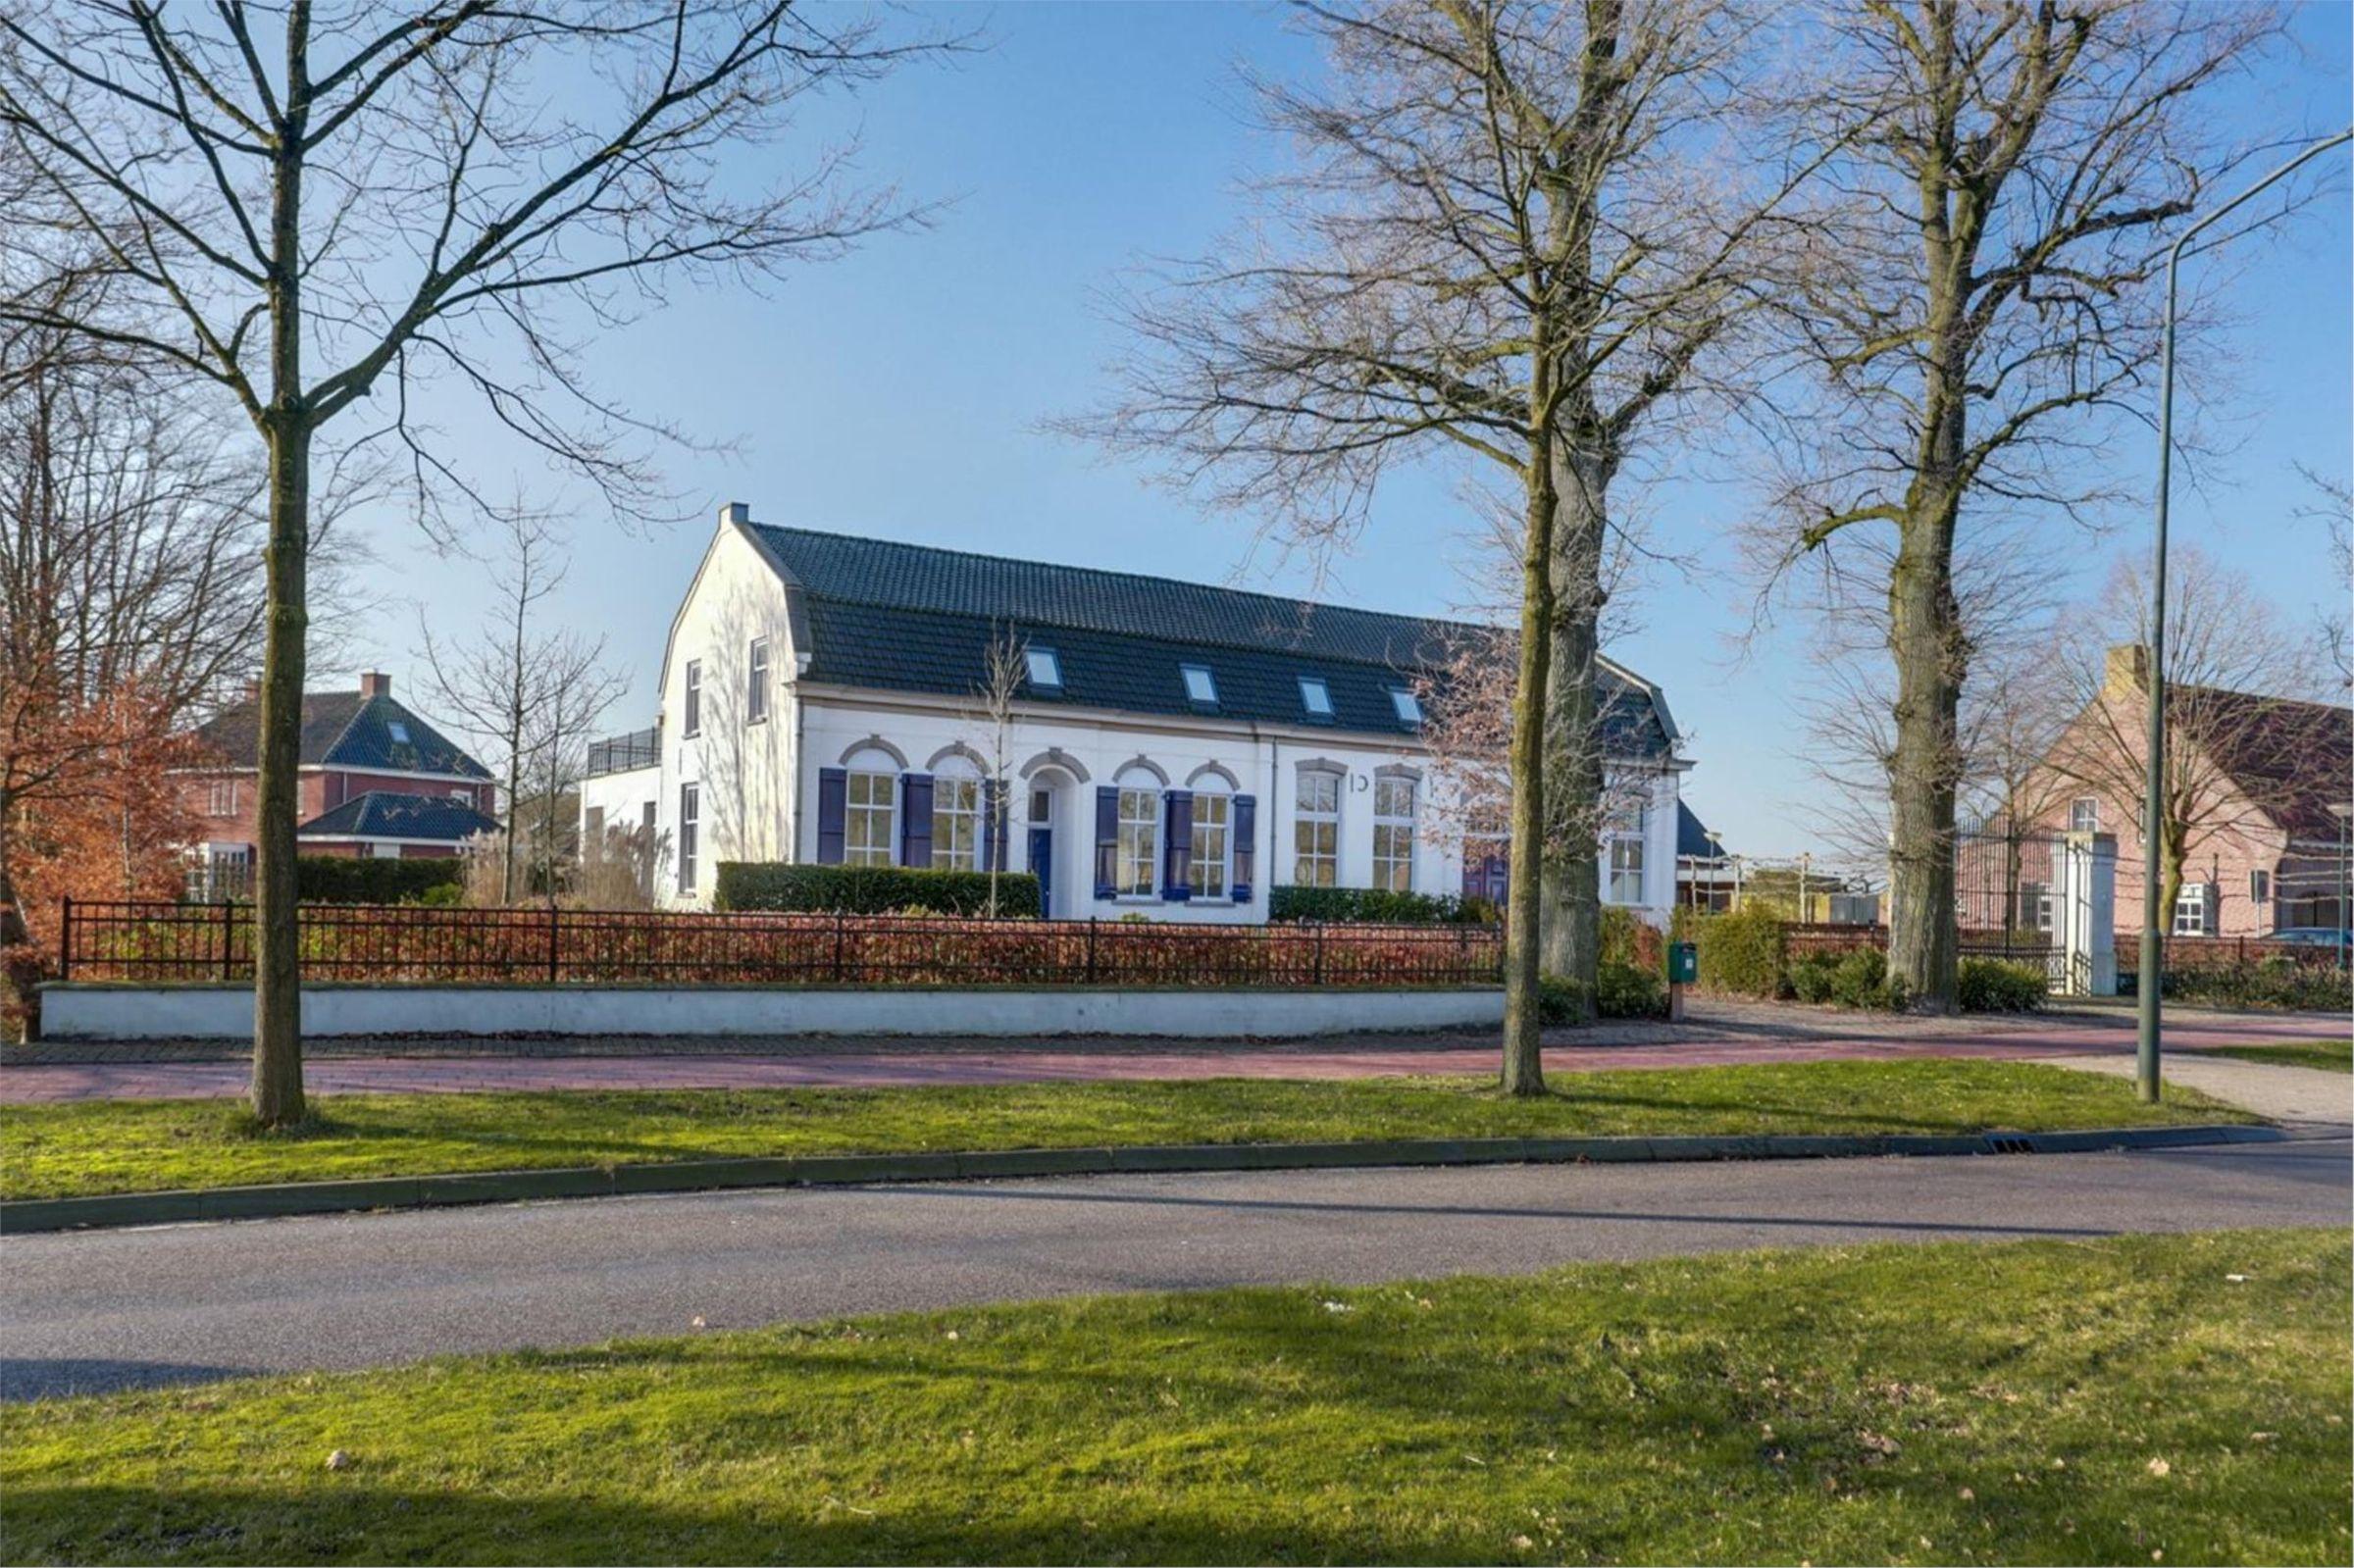 Bredaseweg 57, Chaam